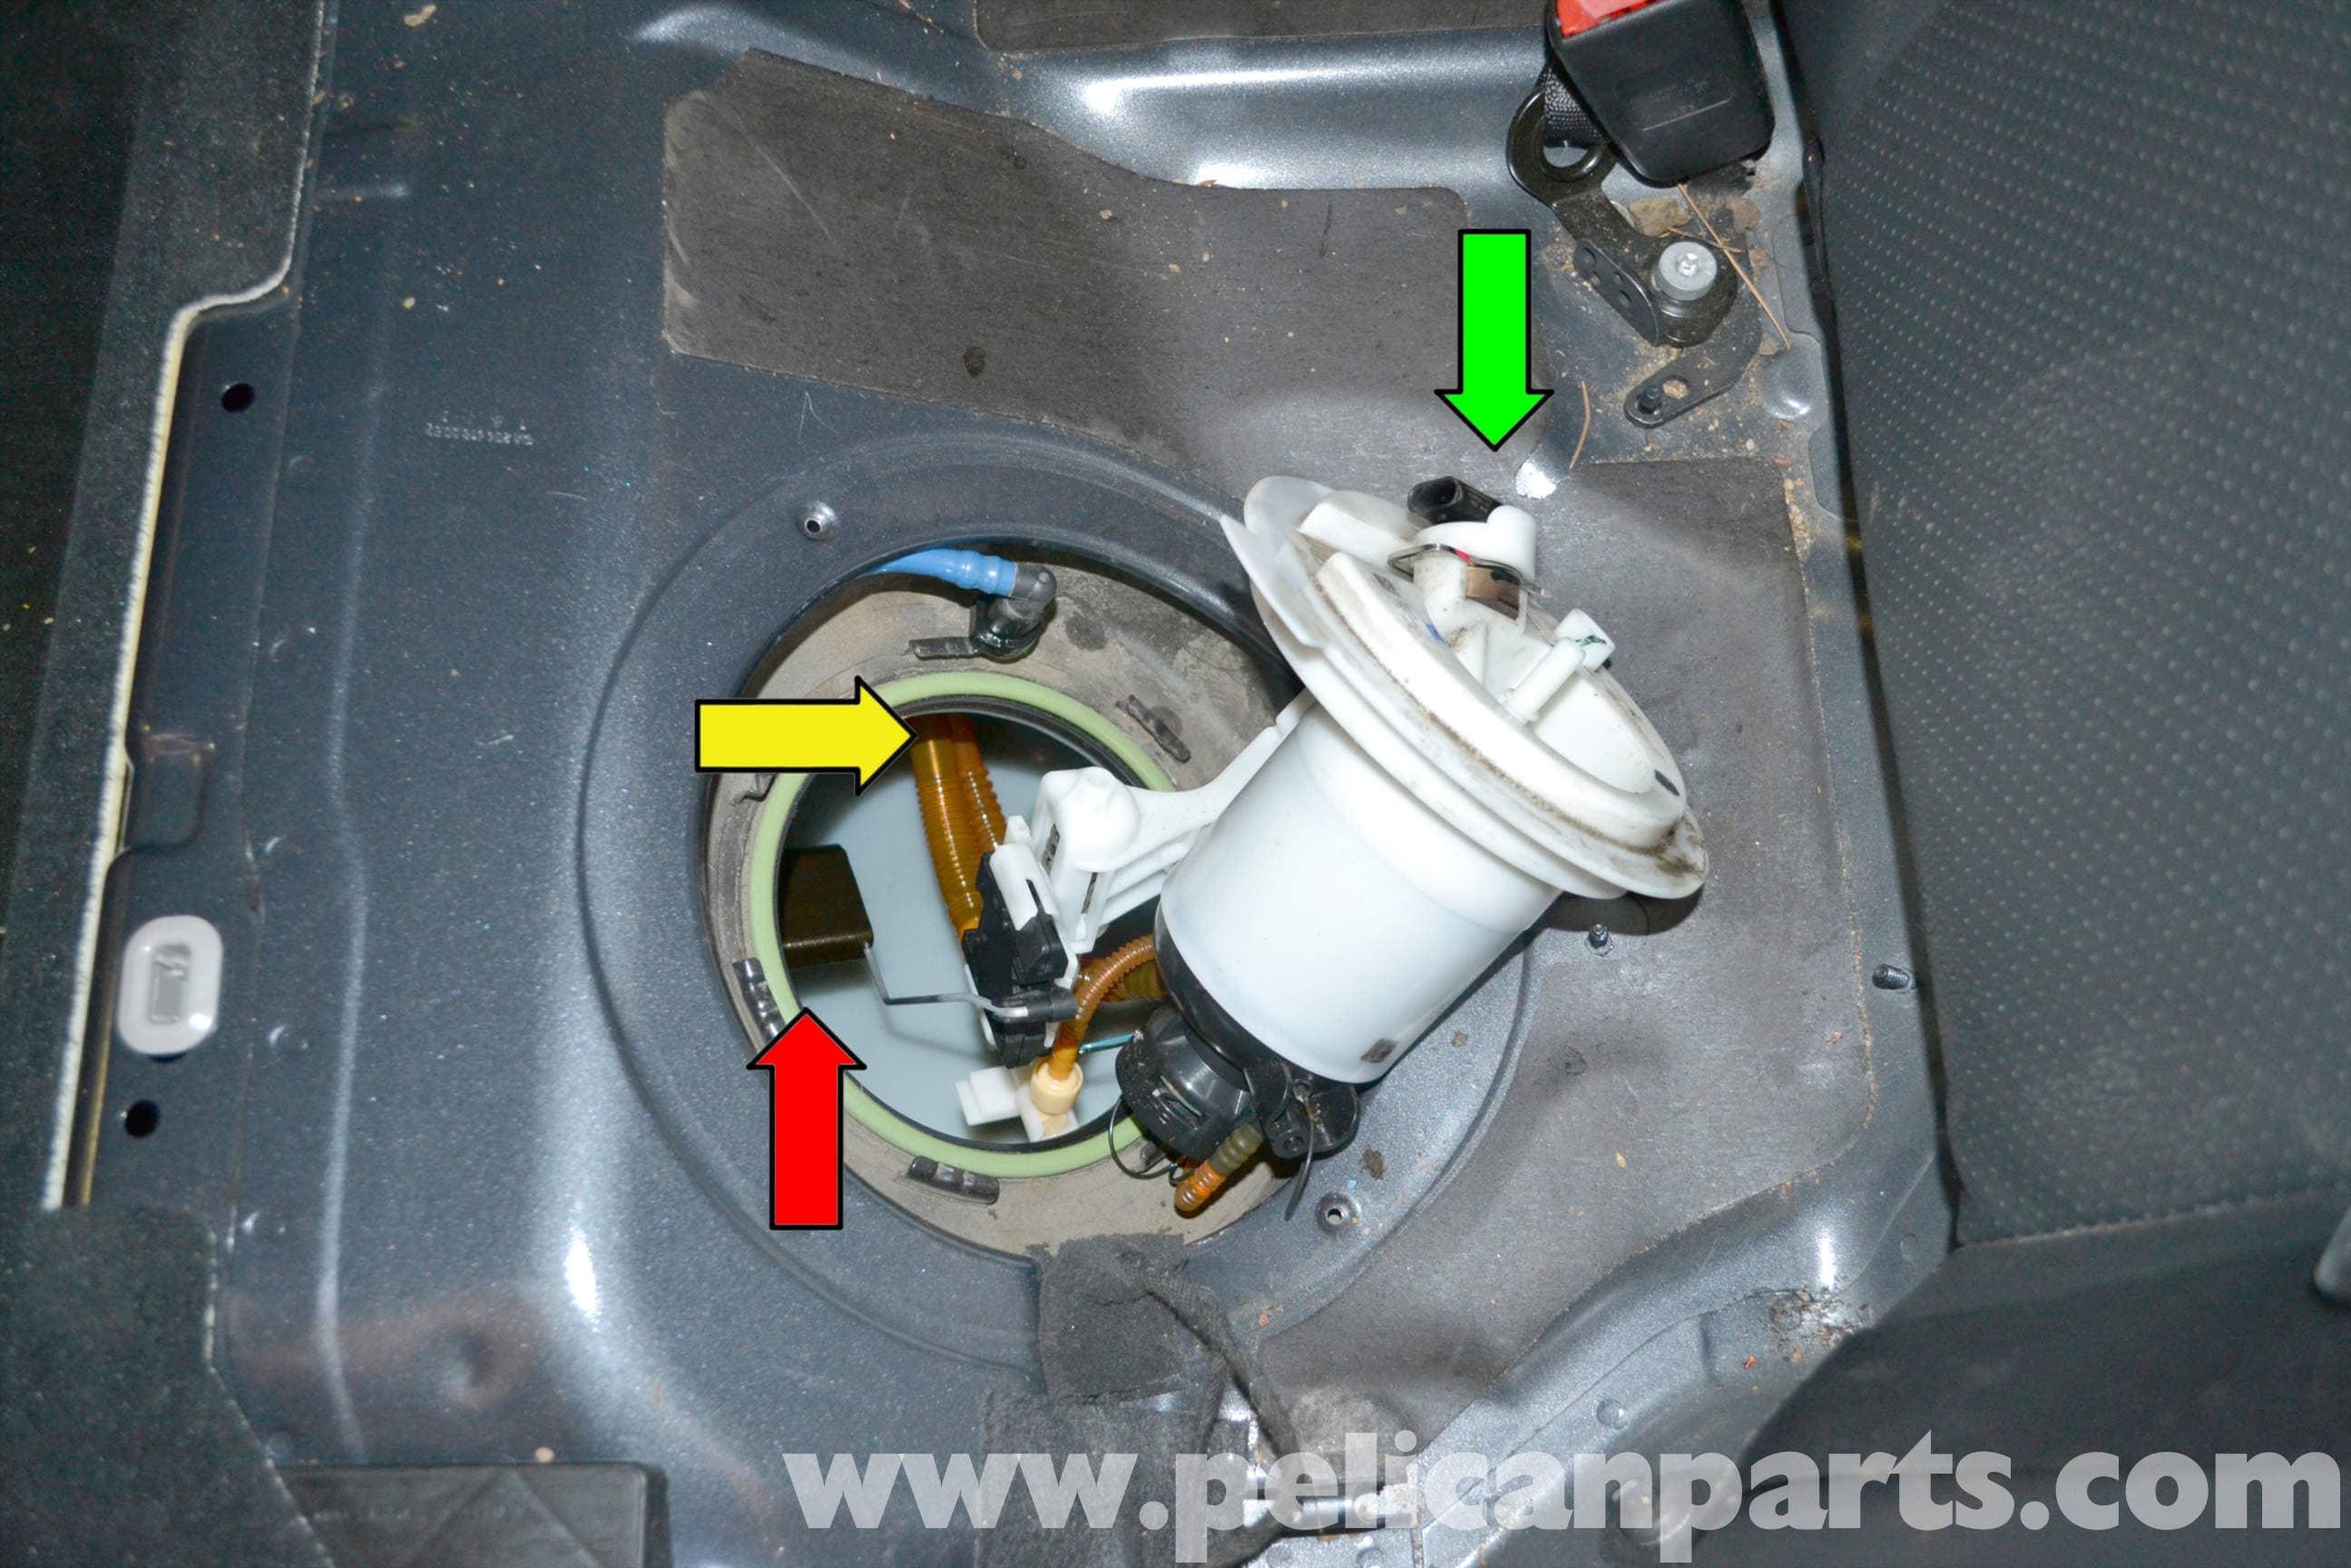 [ANLQ_8698]  Mercedes-Benz W204 Fuel Filter Replacement - (2008-2014) C250, C300, C350 |  Pelican Parts DIY Maintenance Article | Changing Fuel Filter Mercedes |  | Pelican Parts